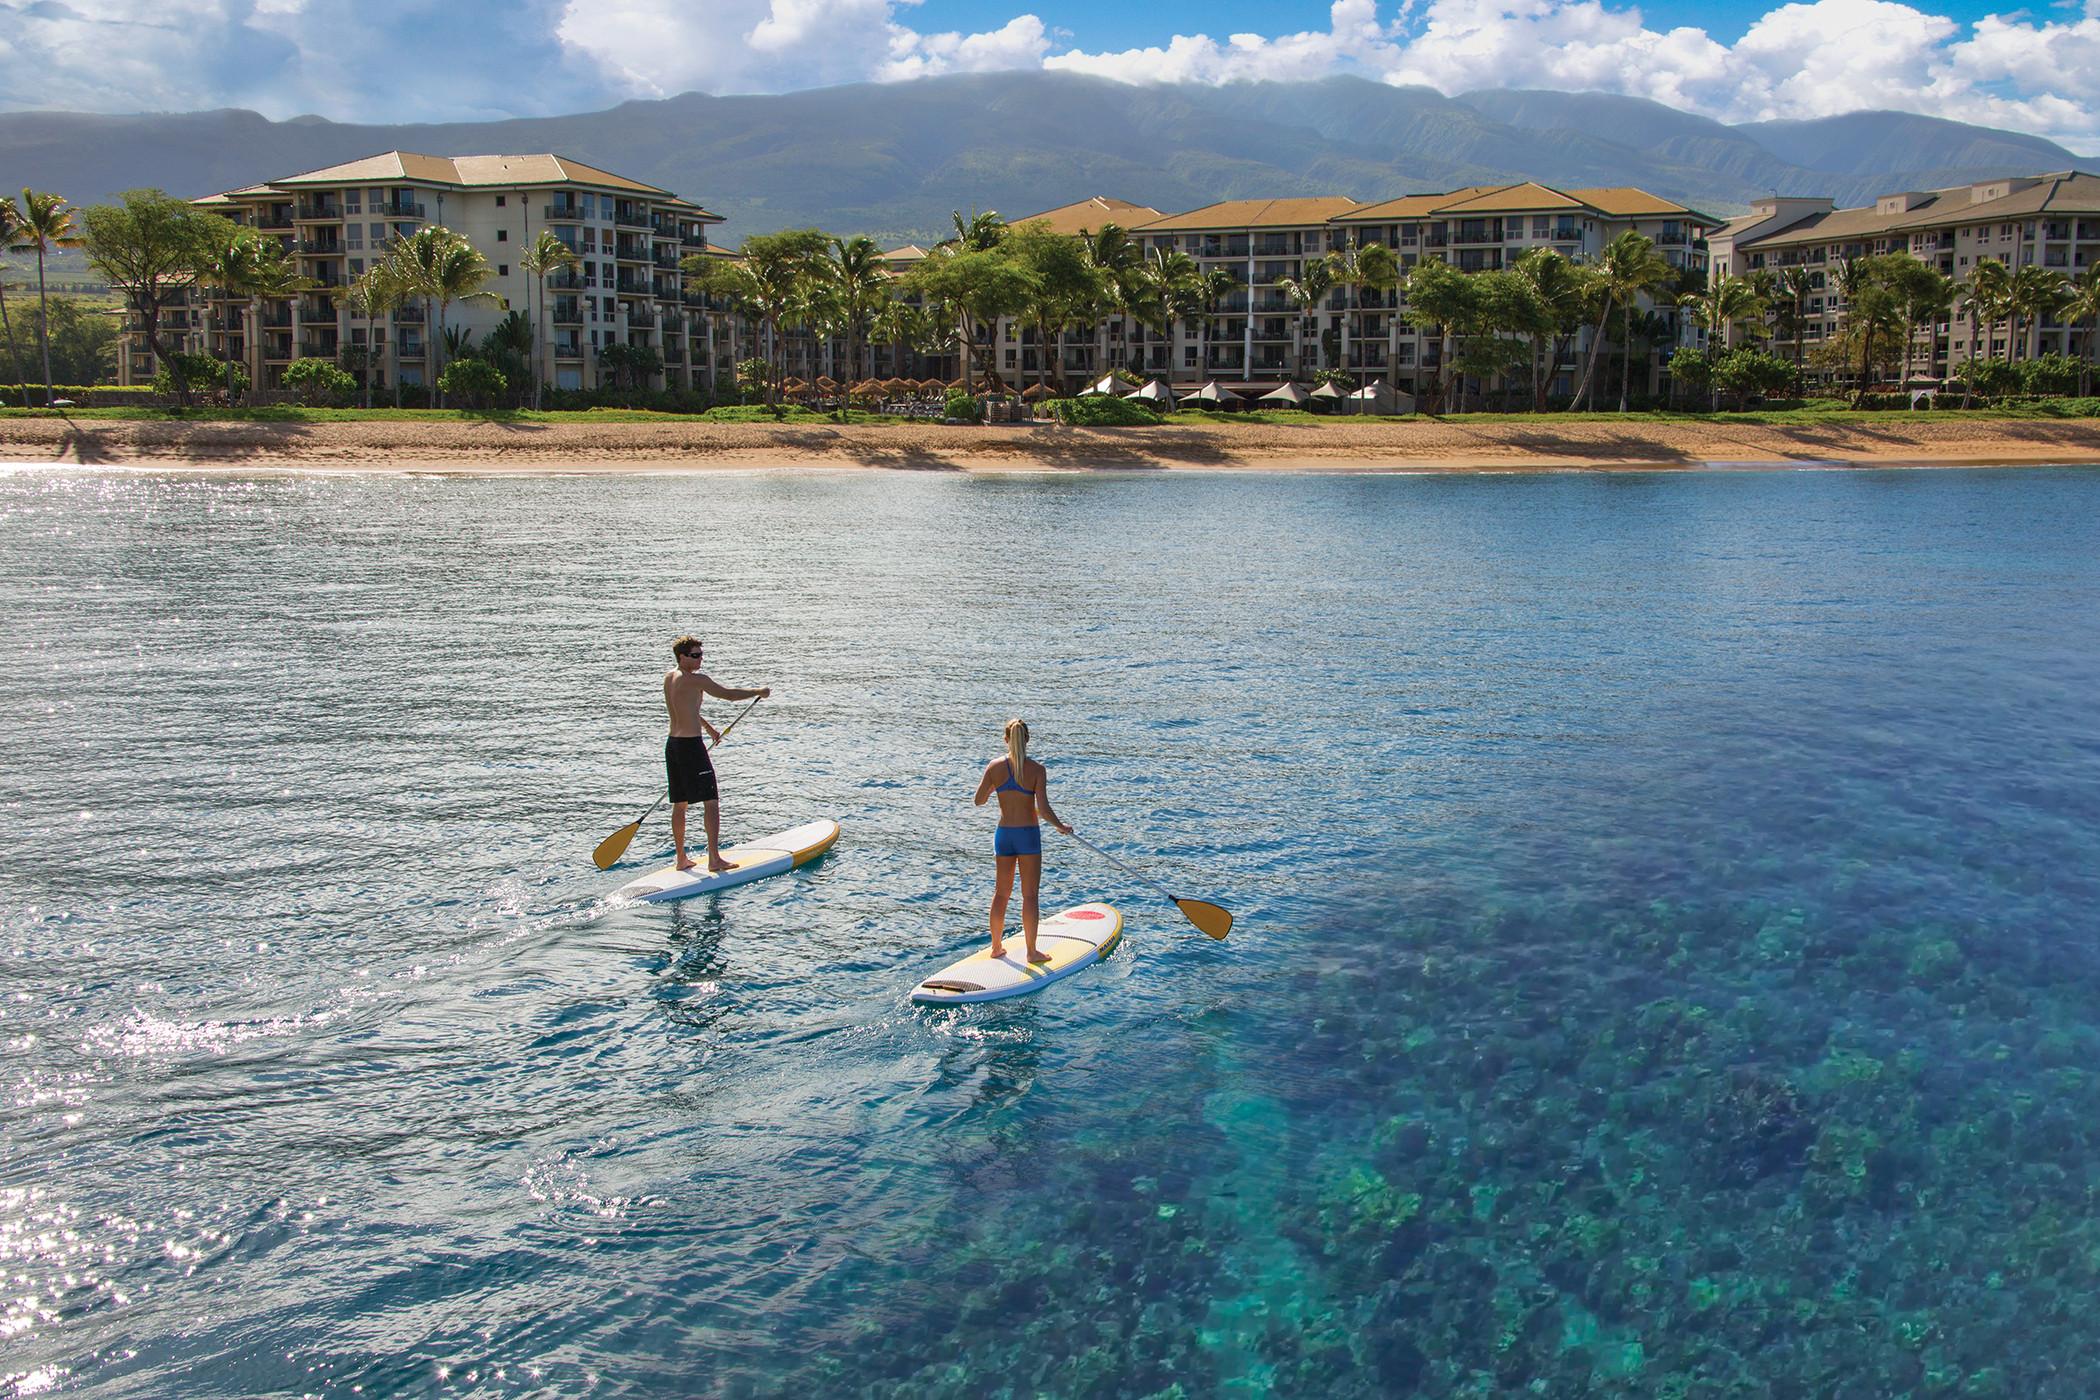 Kā Anapali Beach Paddle Boarding